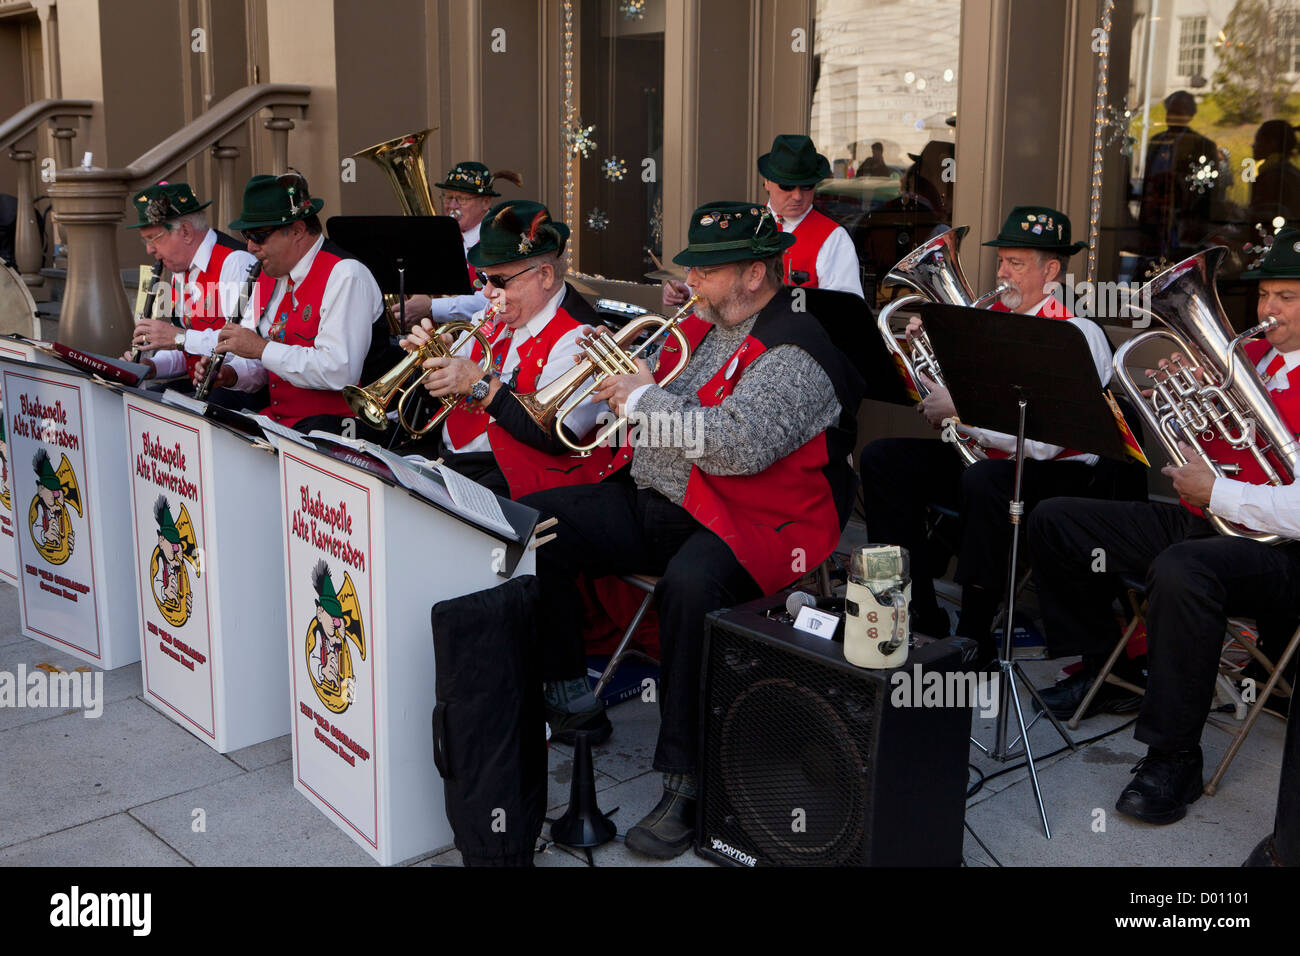 Banda de Música tradicional alemana realizar al aire libre Imagen De Stock